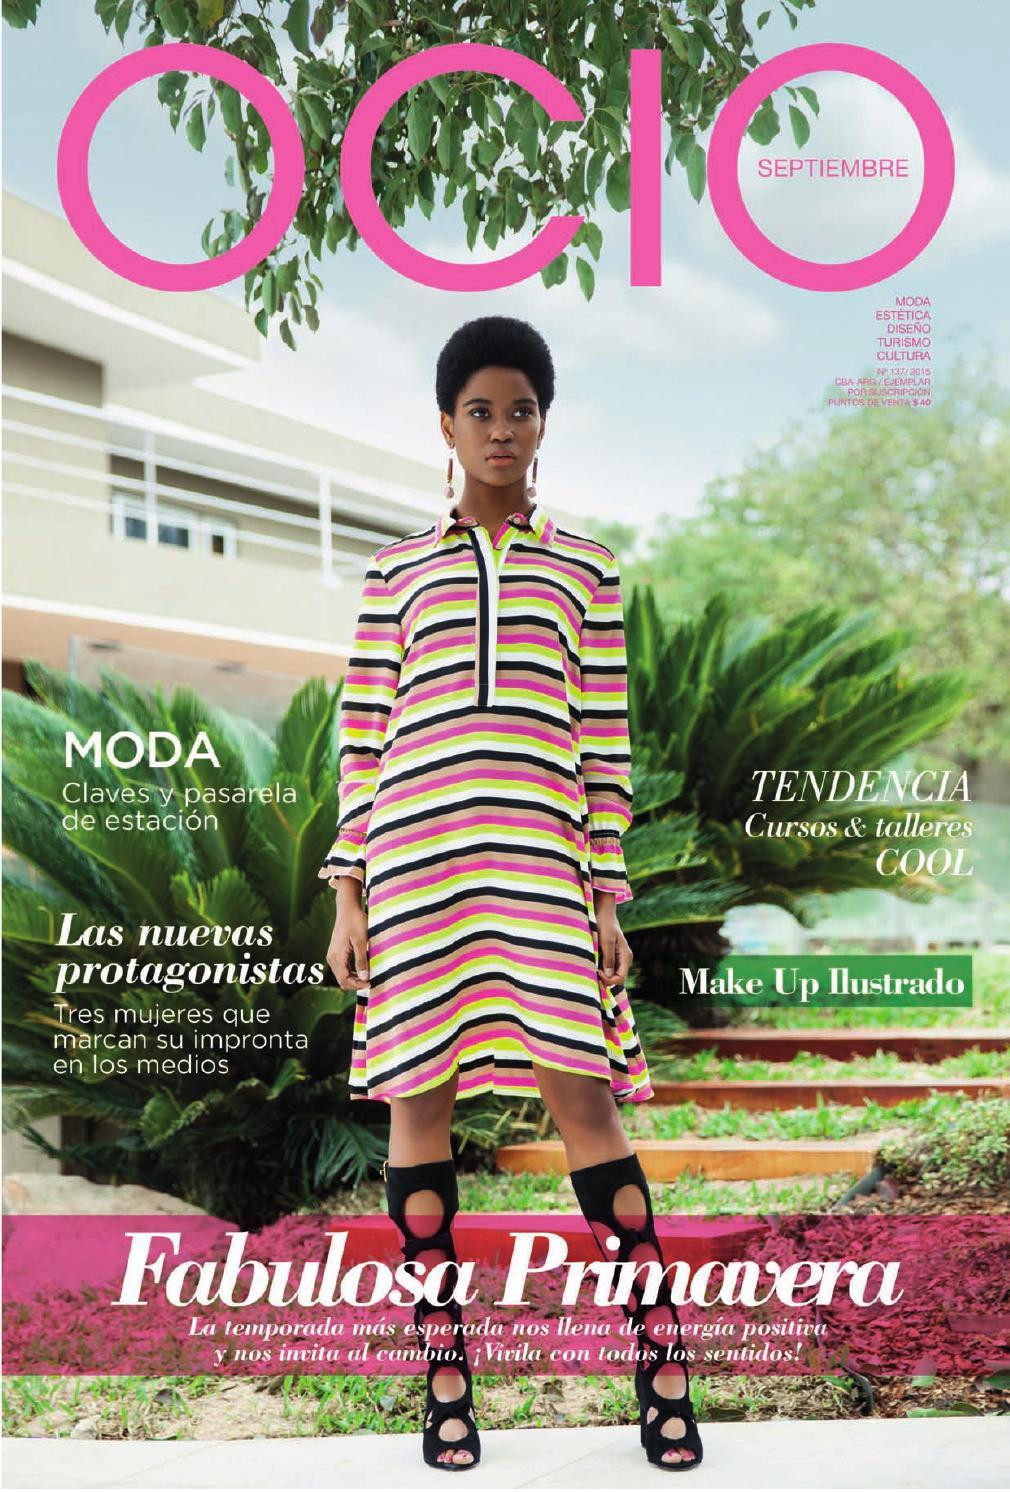 6328292a7e696c Ocio Septiembre 2015 by Revista Ocio - issuu